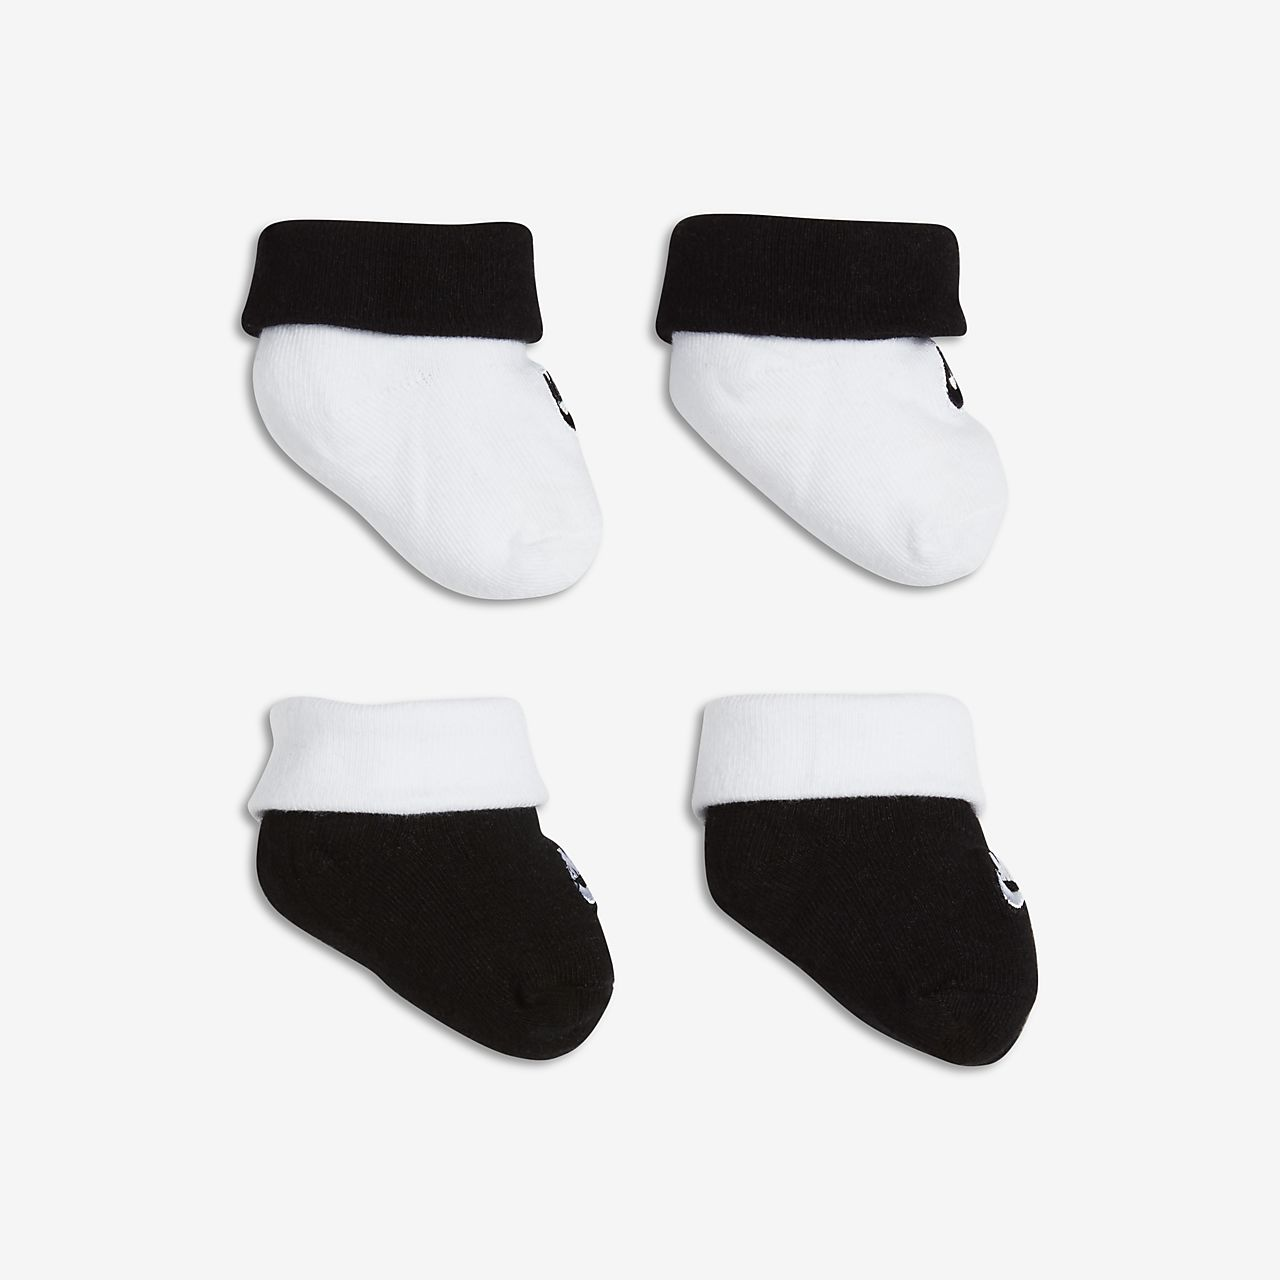 Nike Futura Baby and Toddler Booties (2 Pair)